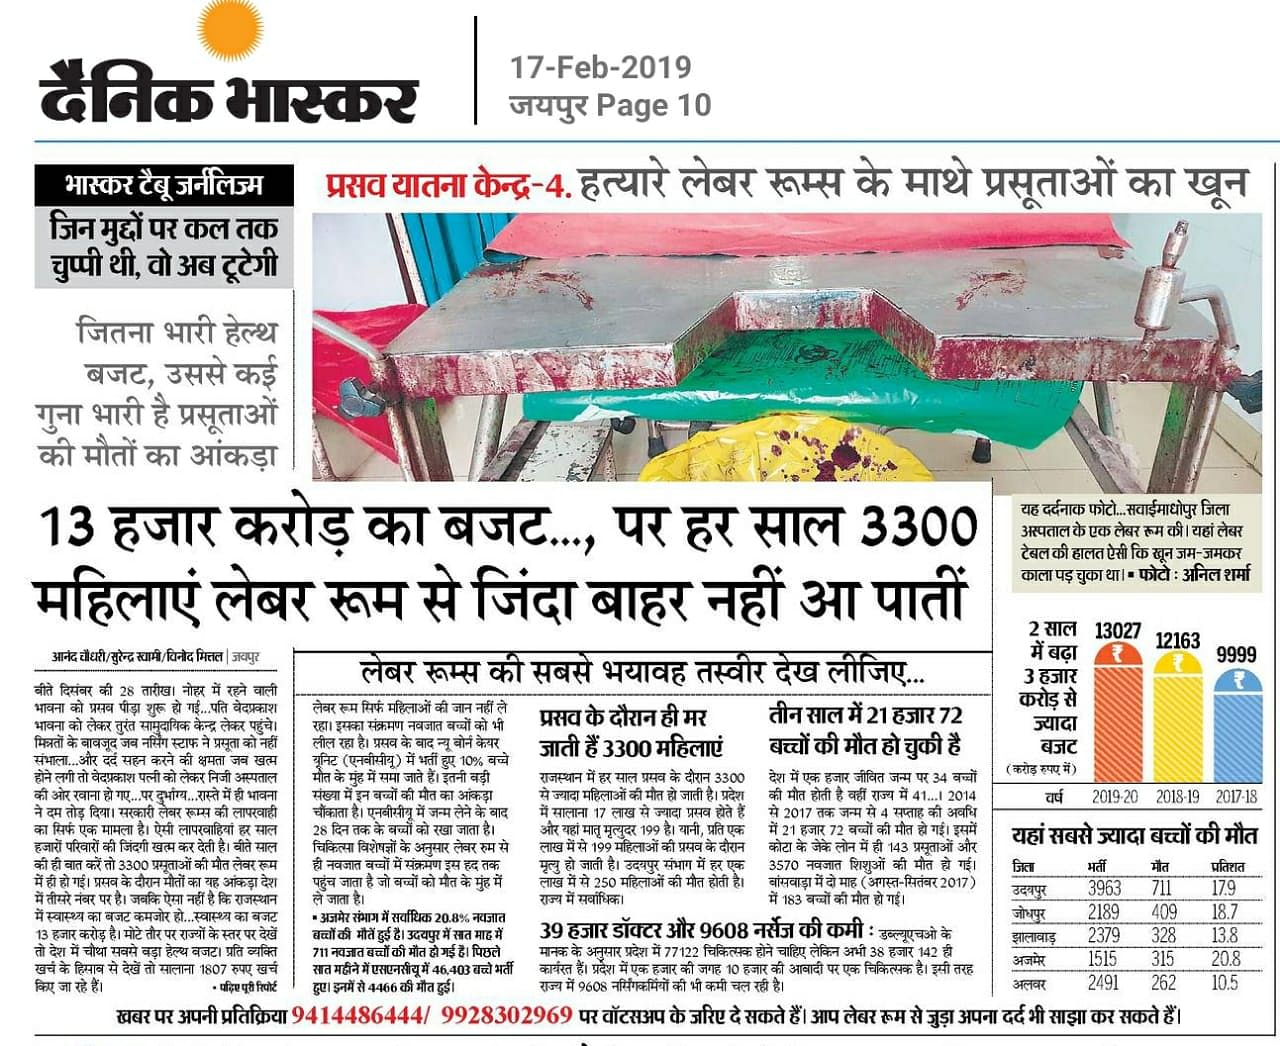 Rajasthan sting operation woman labour room activist maternal health India jov30